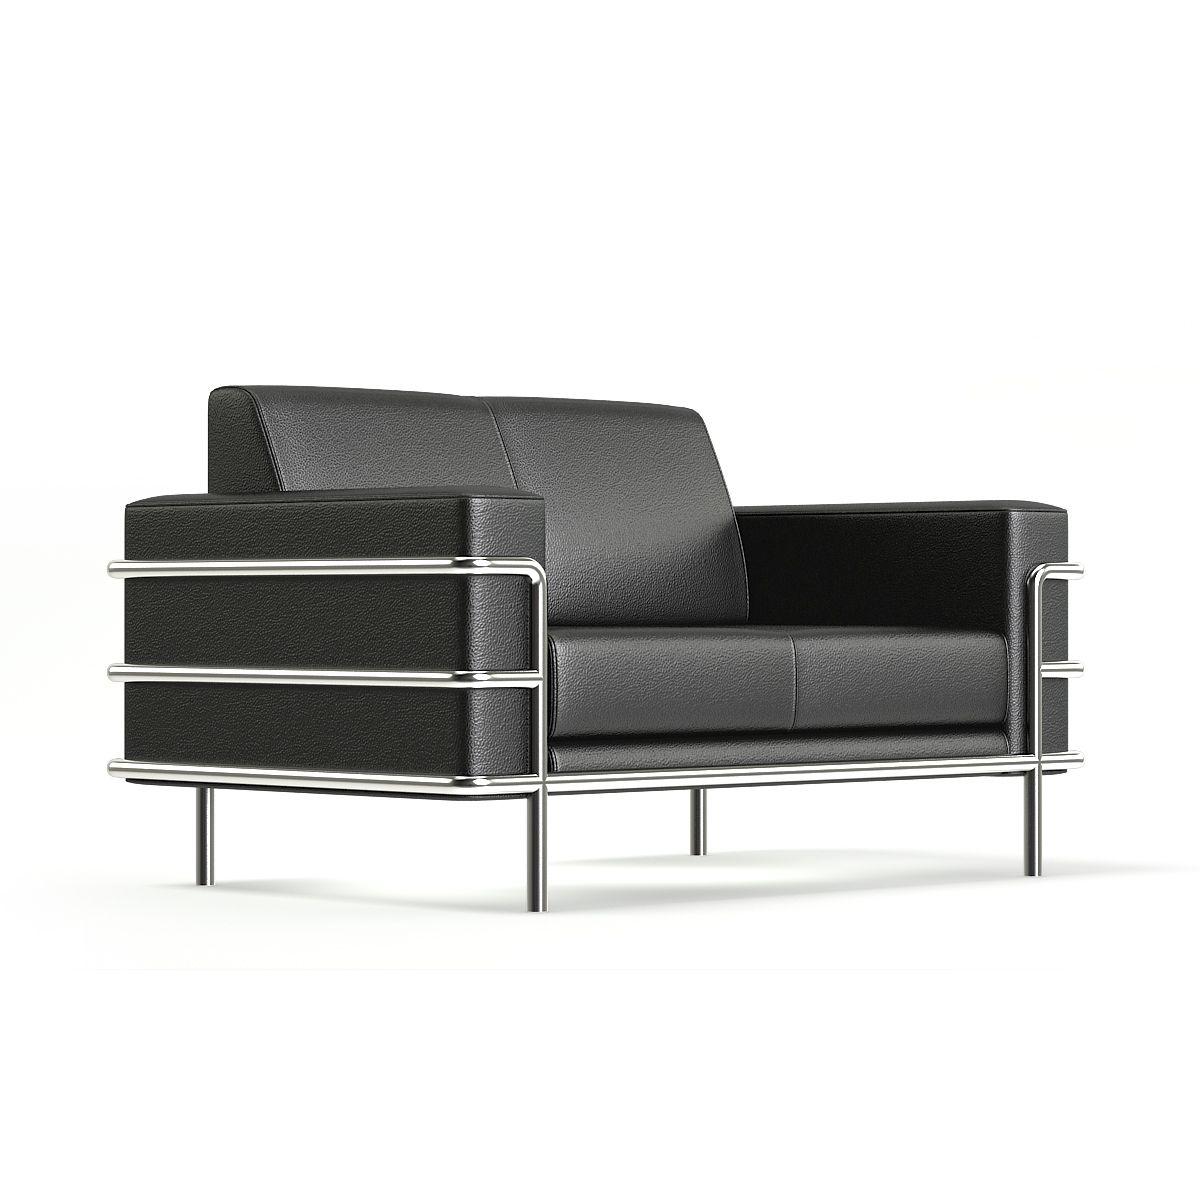 Black Leather Sofa 3d Model Leather Black Model Sofa